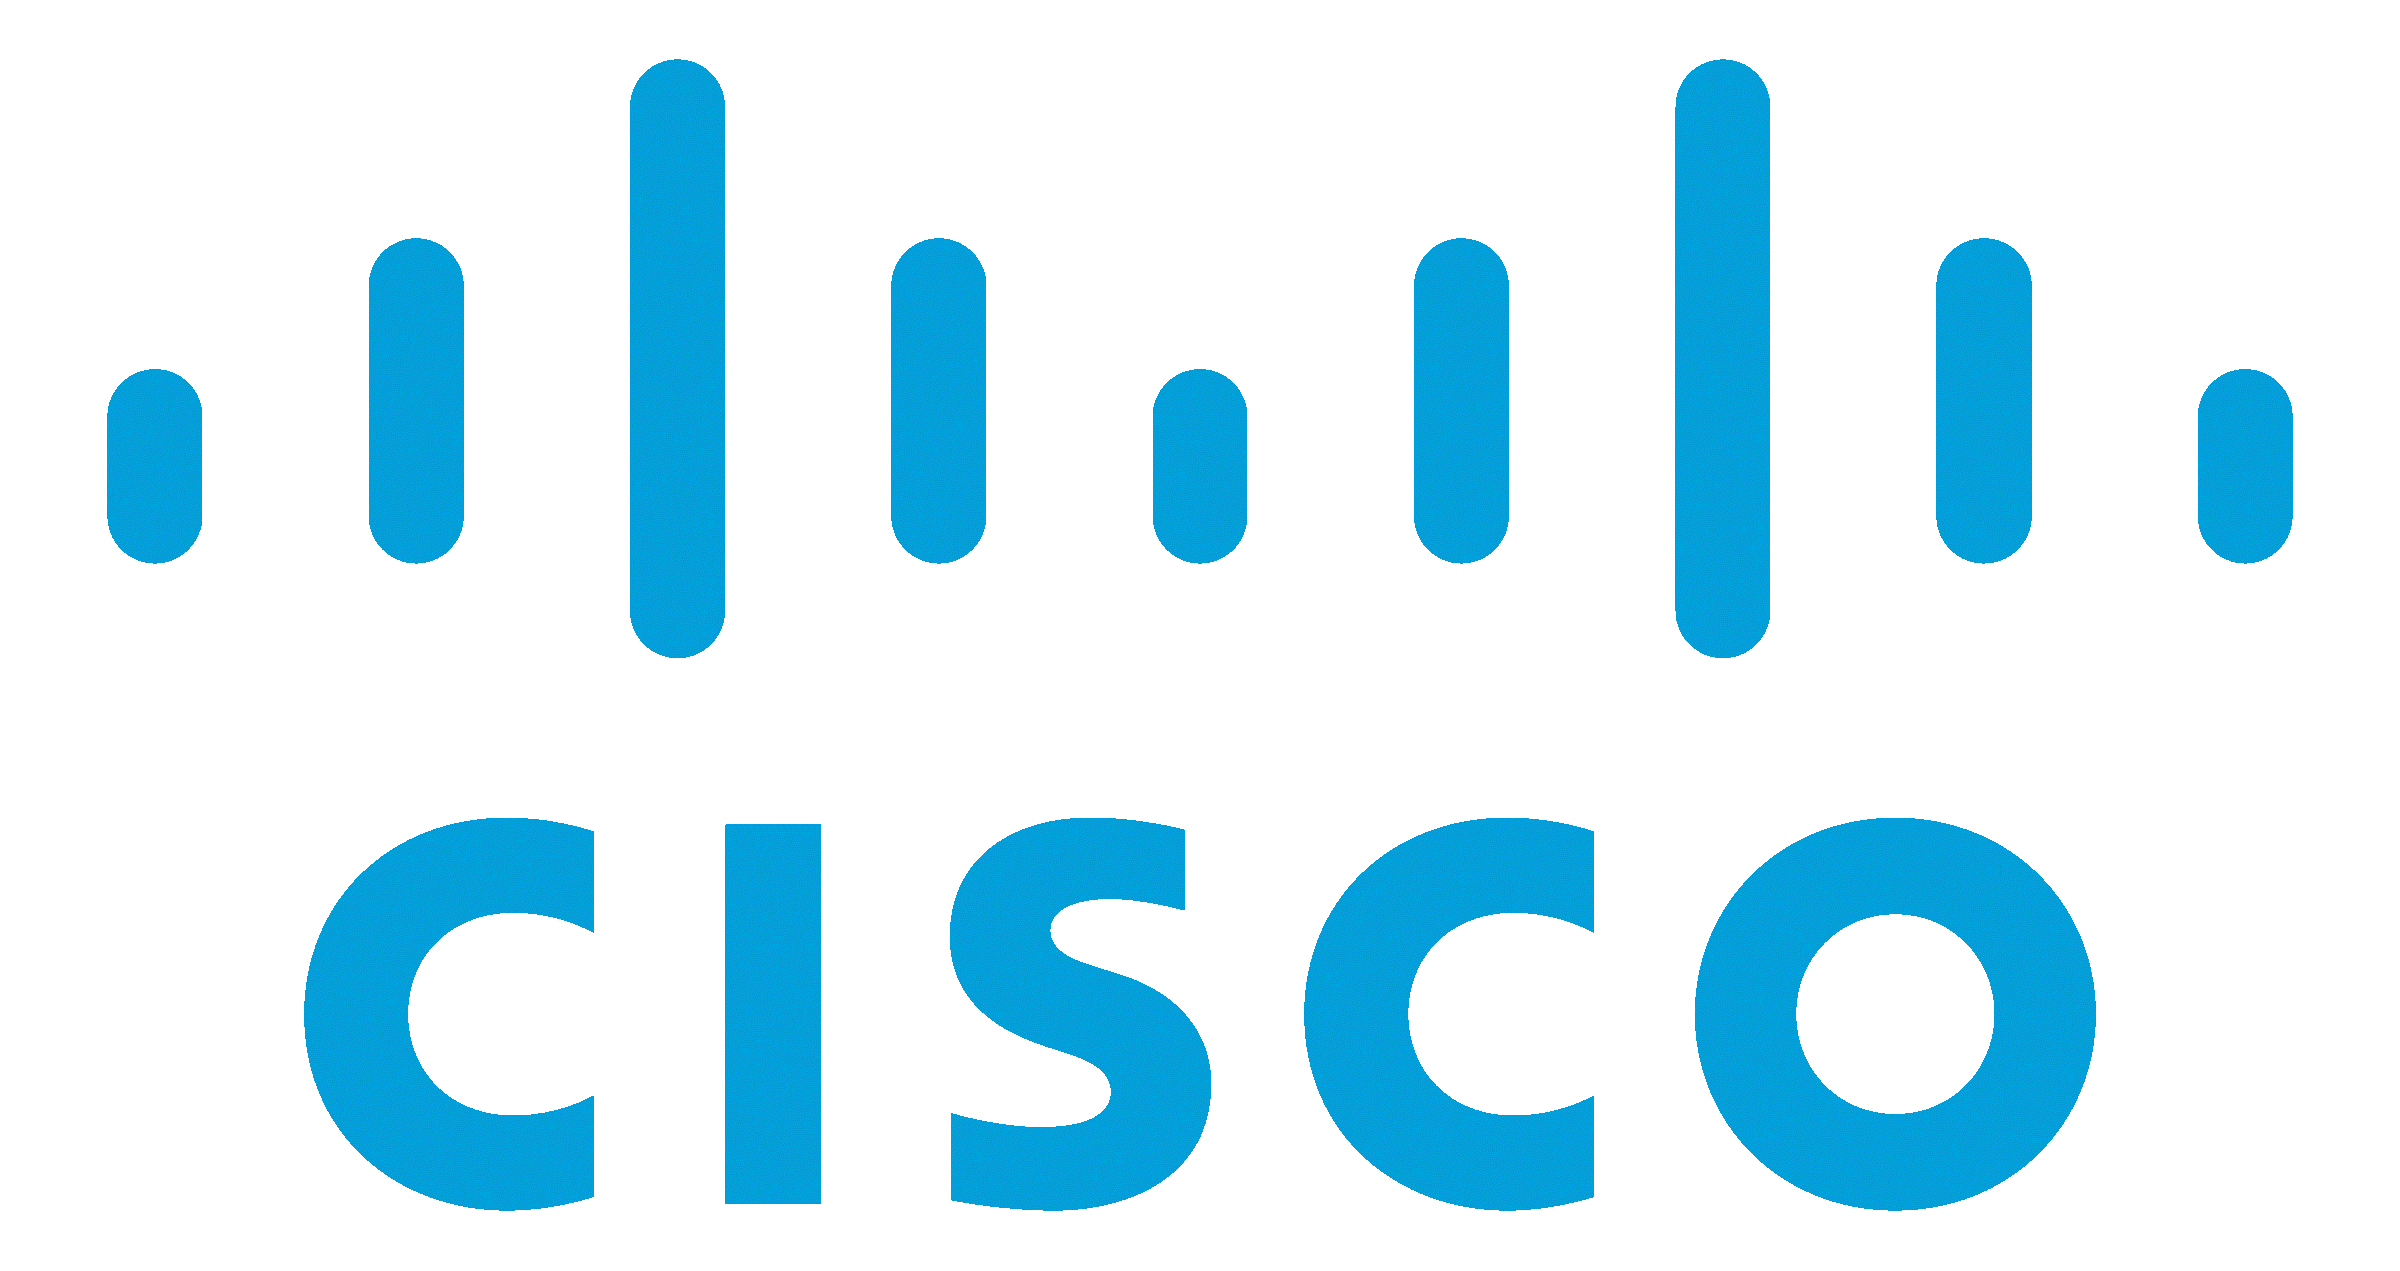 Cisco Banner 4vets